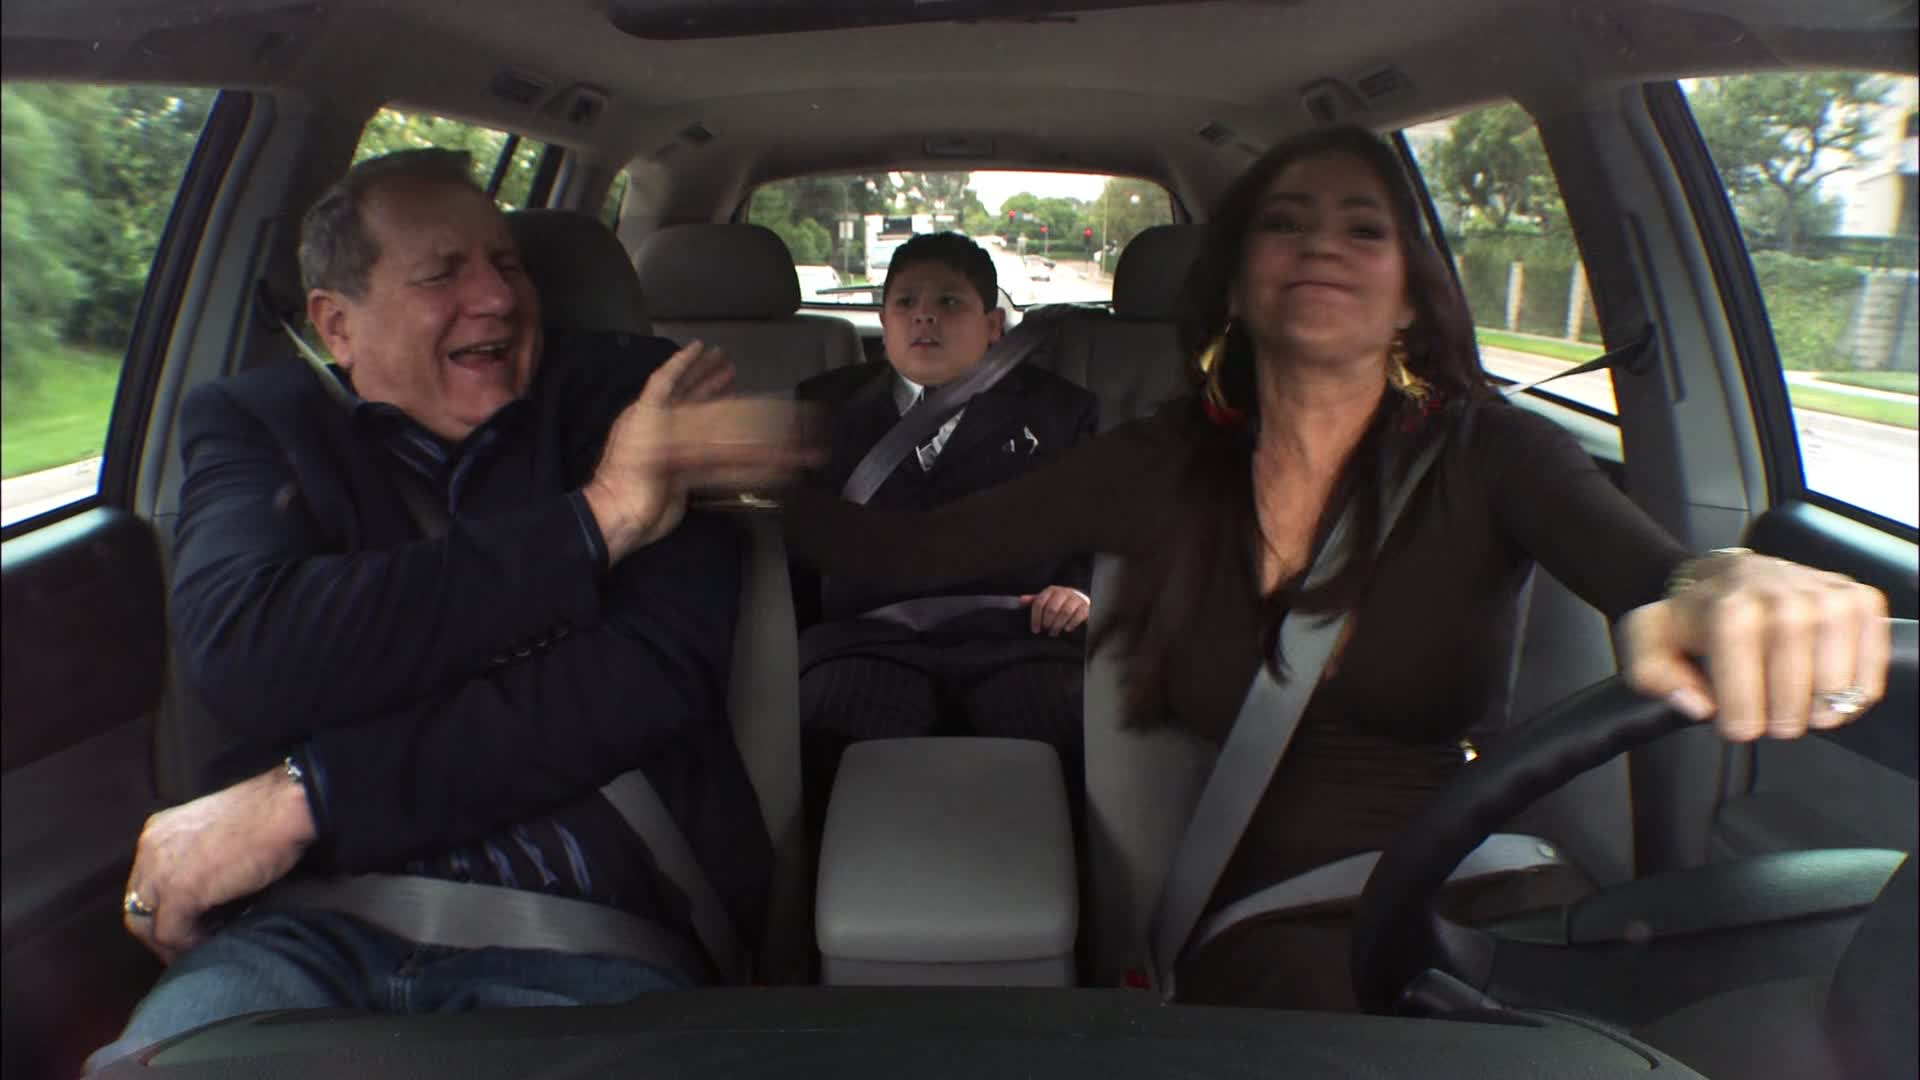 Sofia Vergara tamper tantrum driving scene from Modern Family